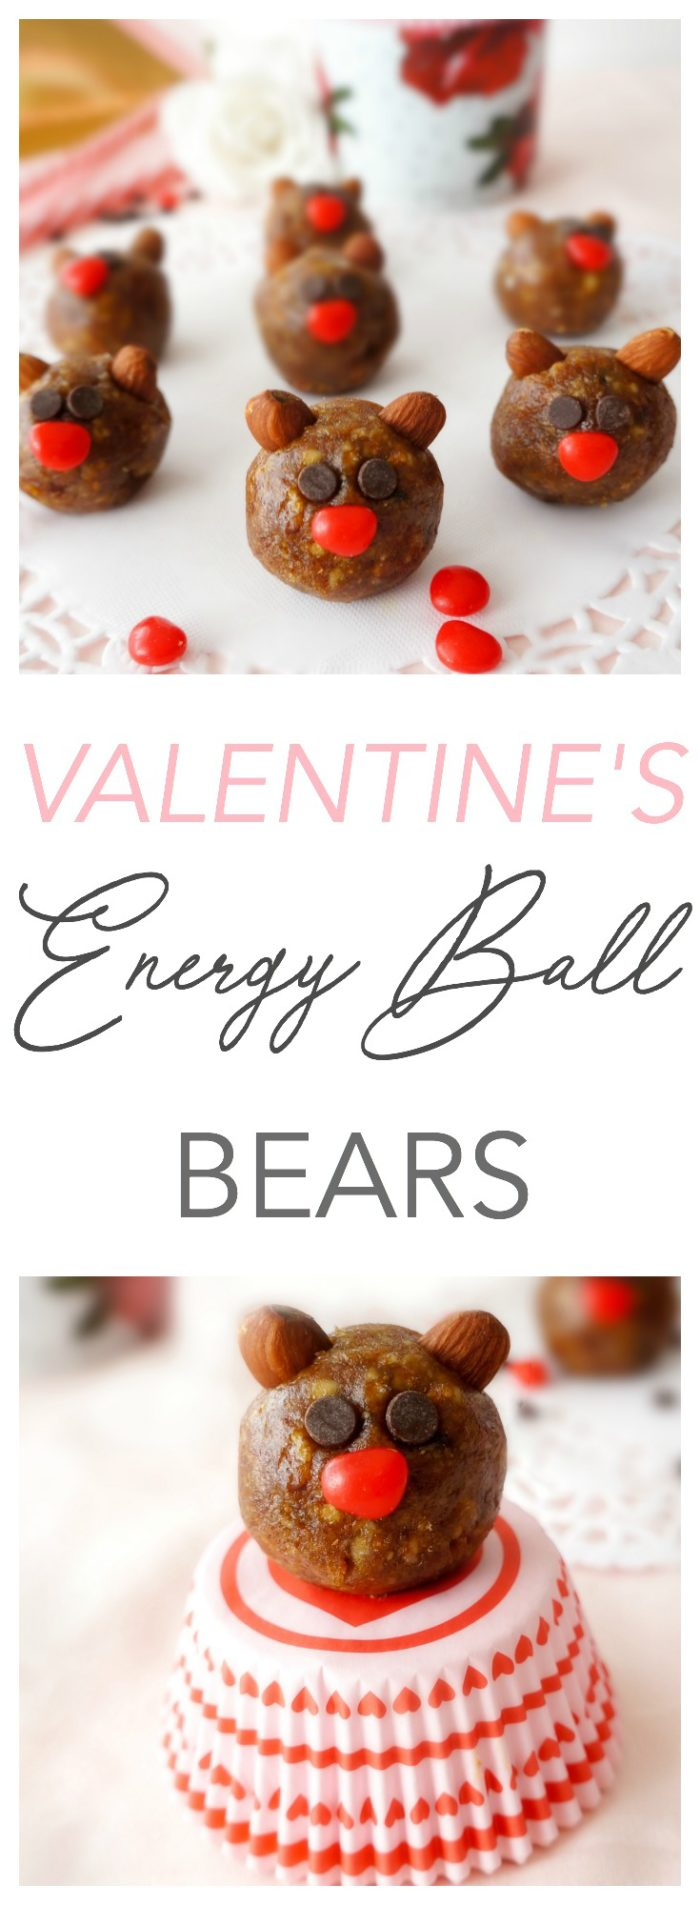 Valentine's Energy Ball Bears